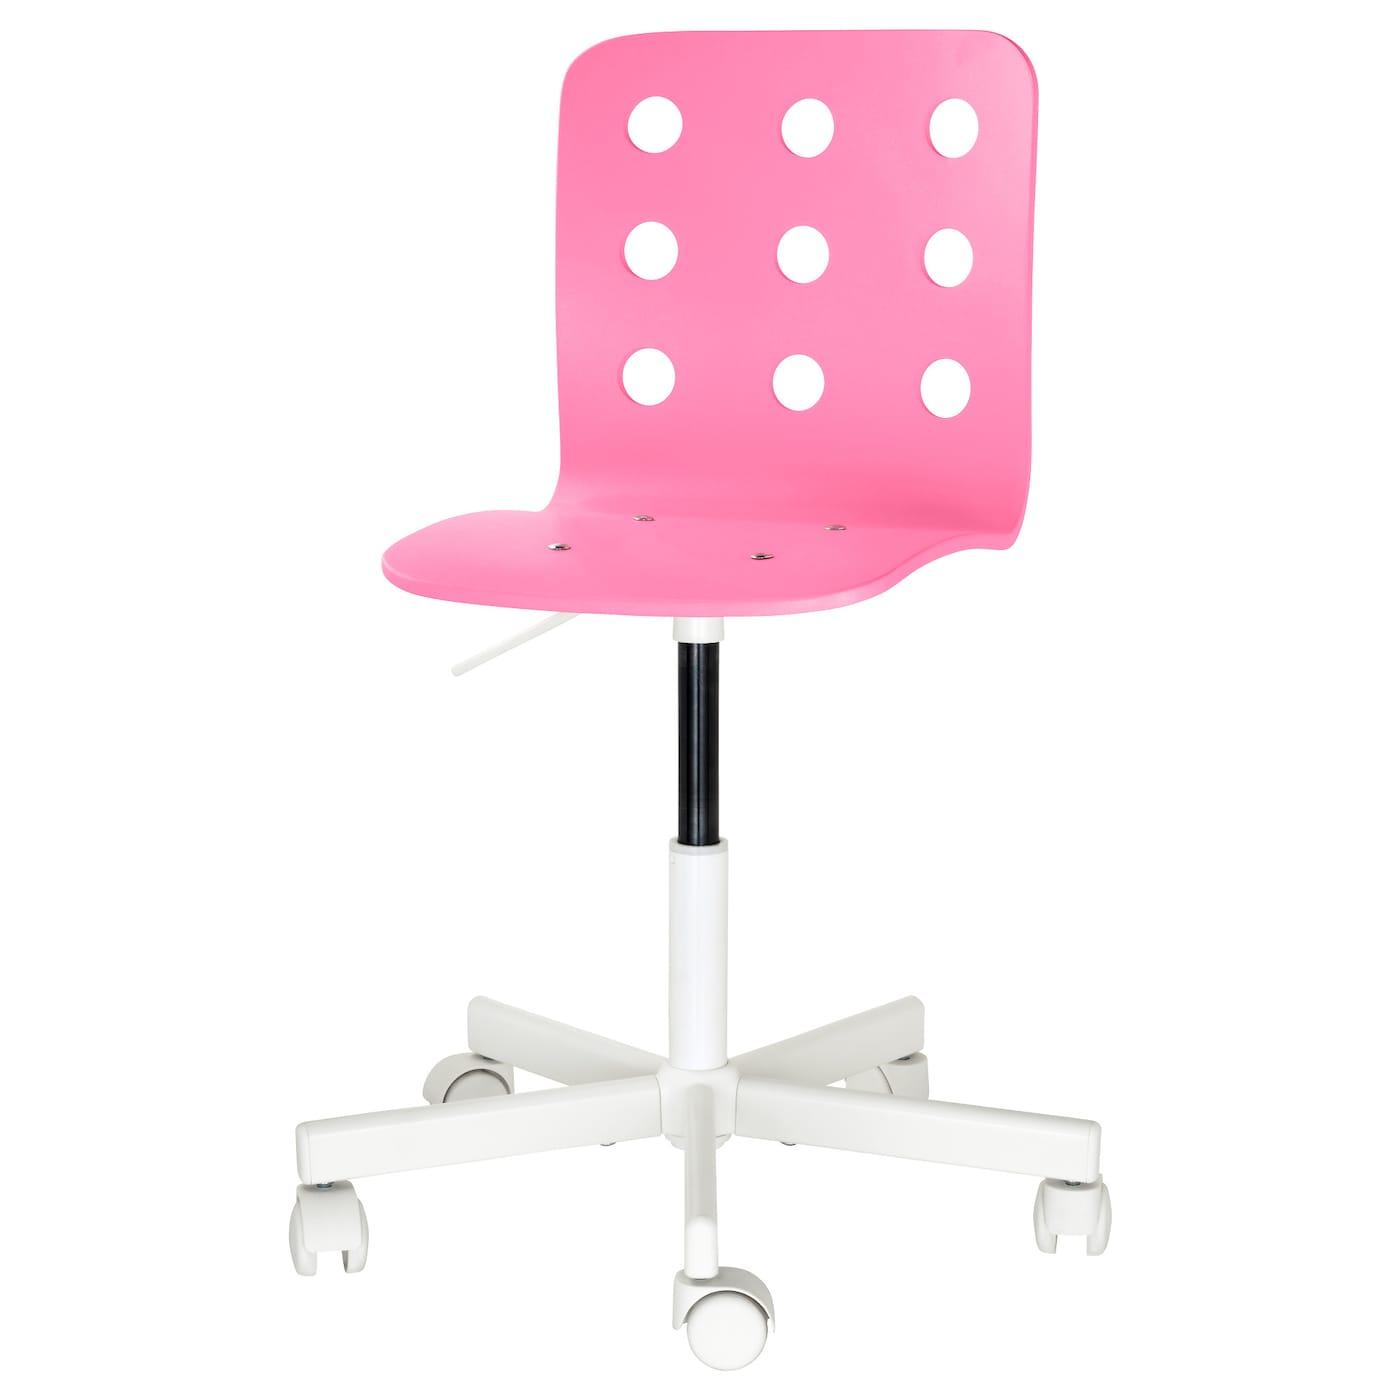 Bureaustoel Kind Roze.Jules Kinderbureaustoel Roze Wit Ikea